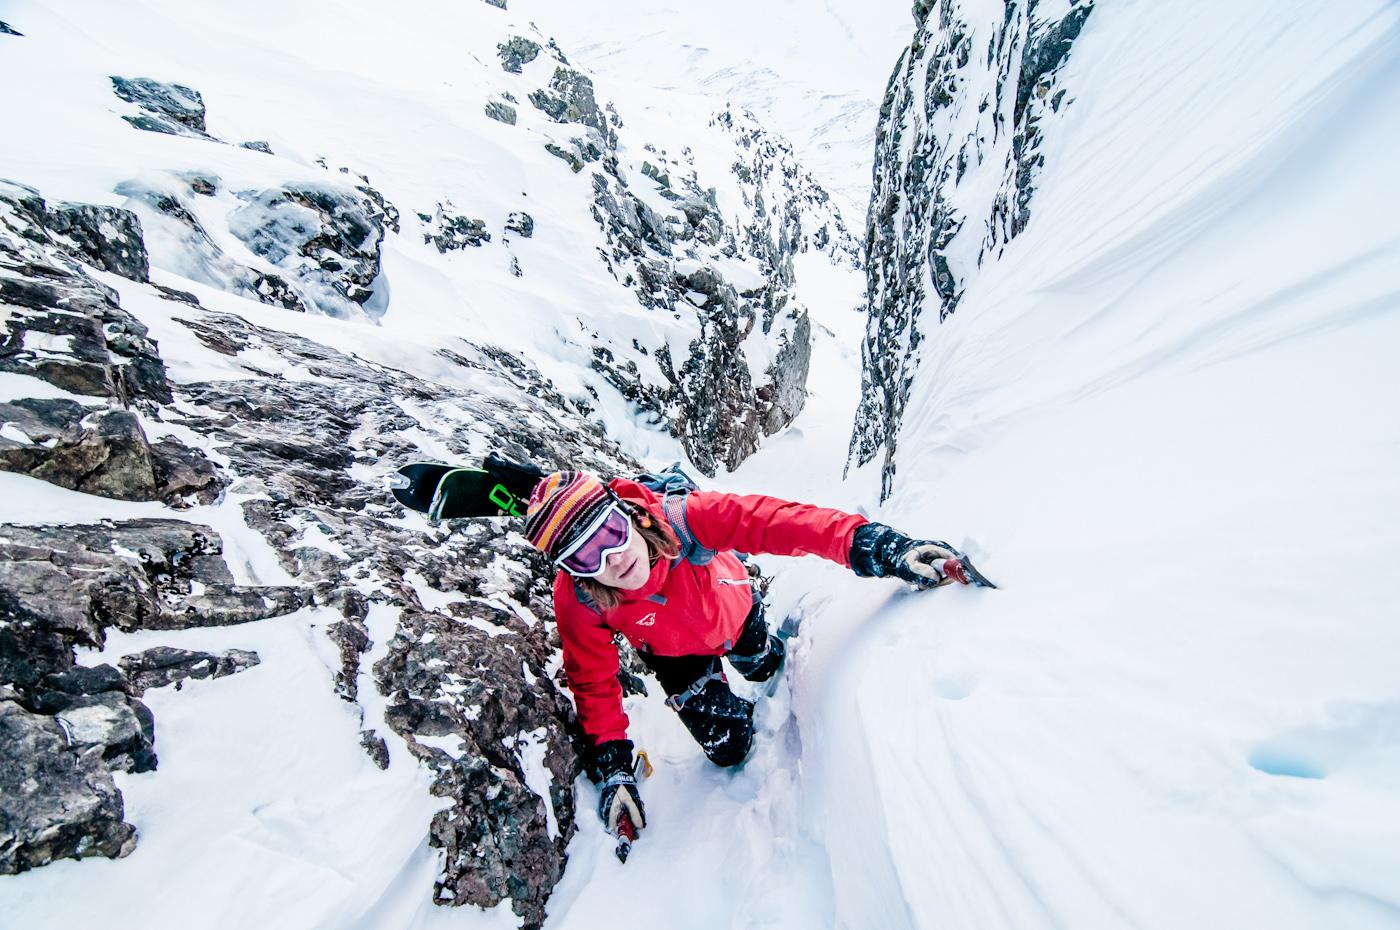 Alpinisme in Lunndörren, Jämtland